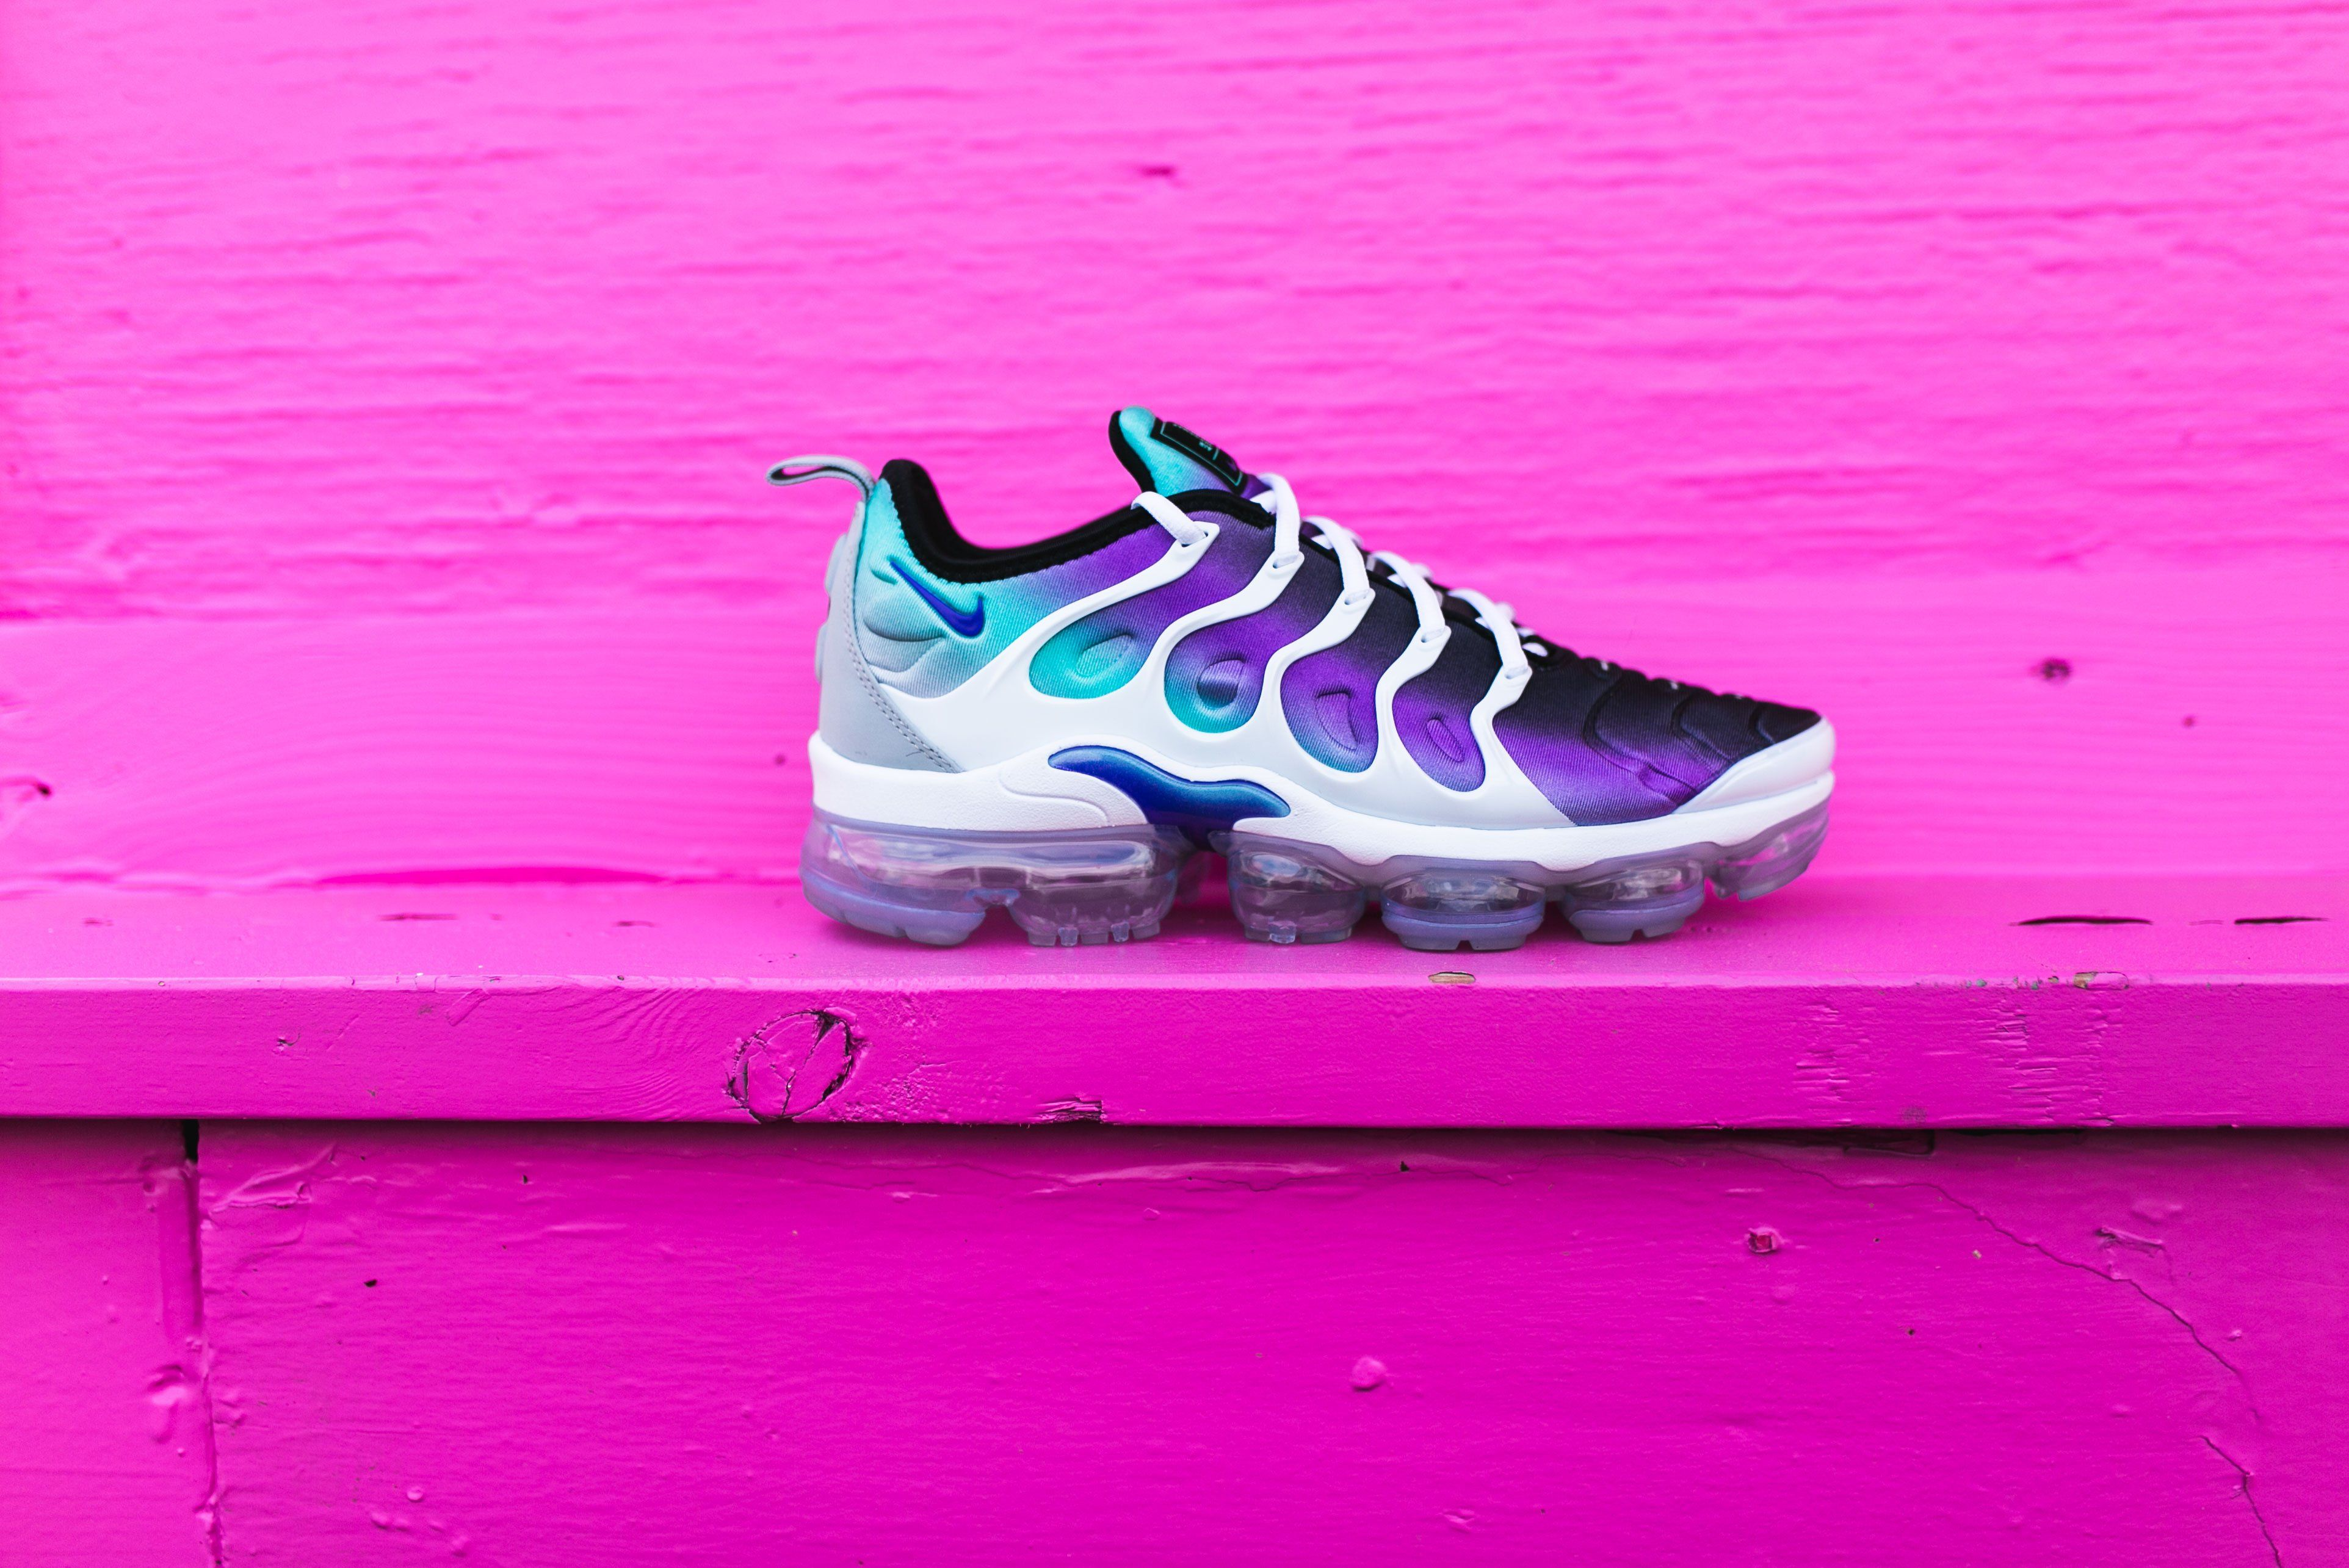 new arrival 5552b 4a2a7 Nike Air VaporMax Plus (White/Fierce Purple) | Products ...